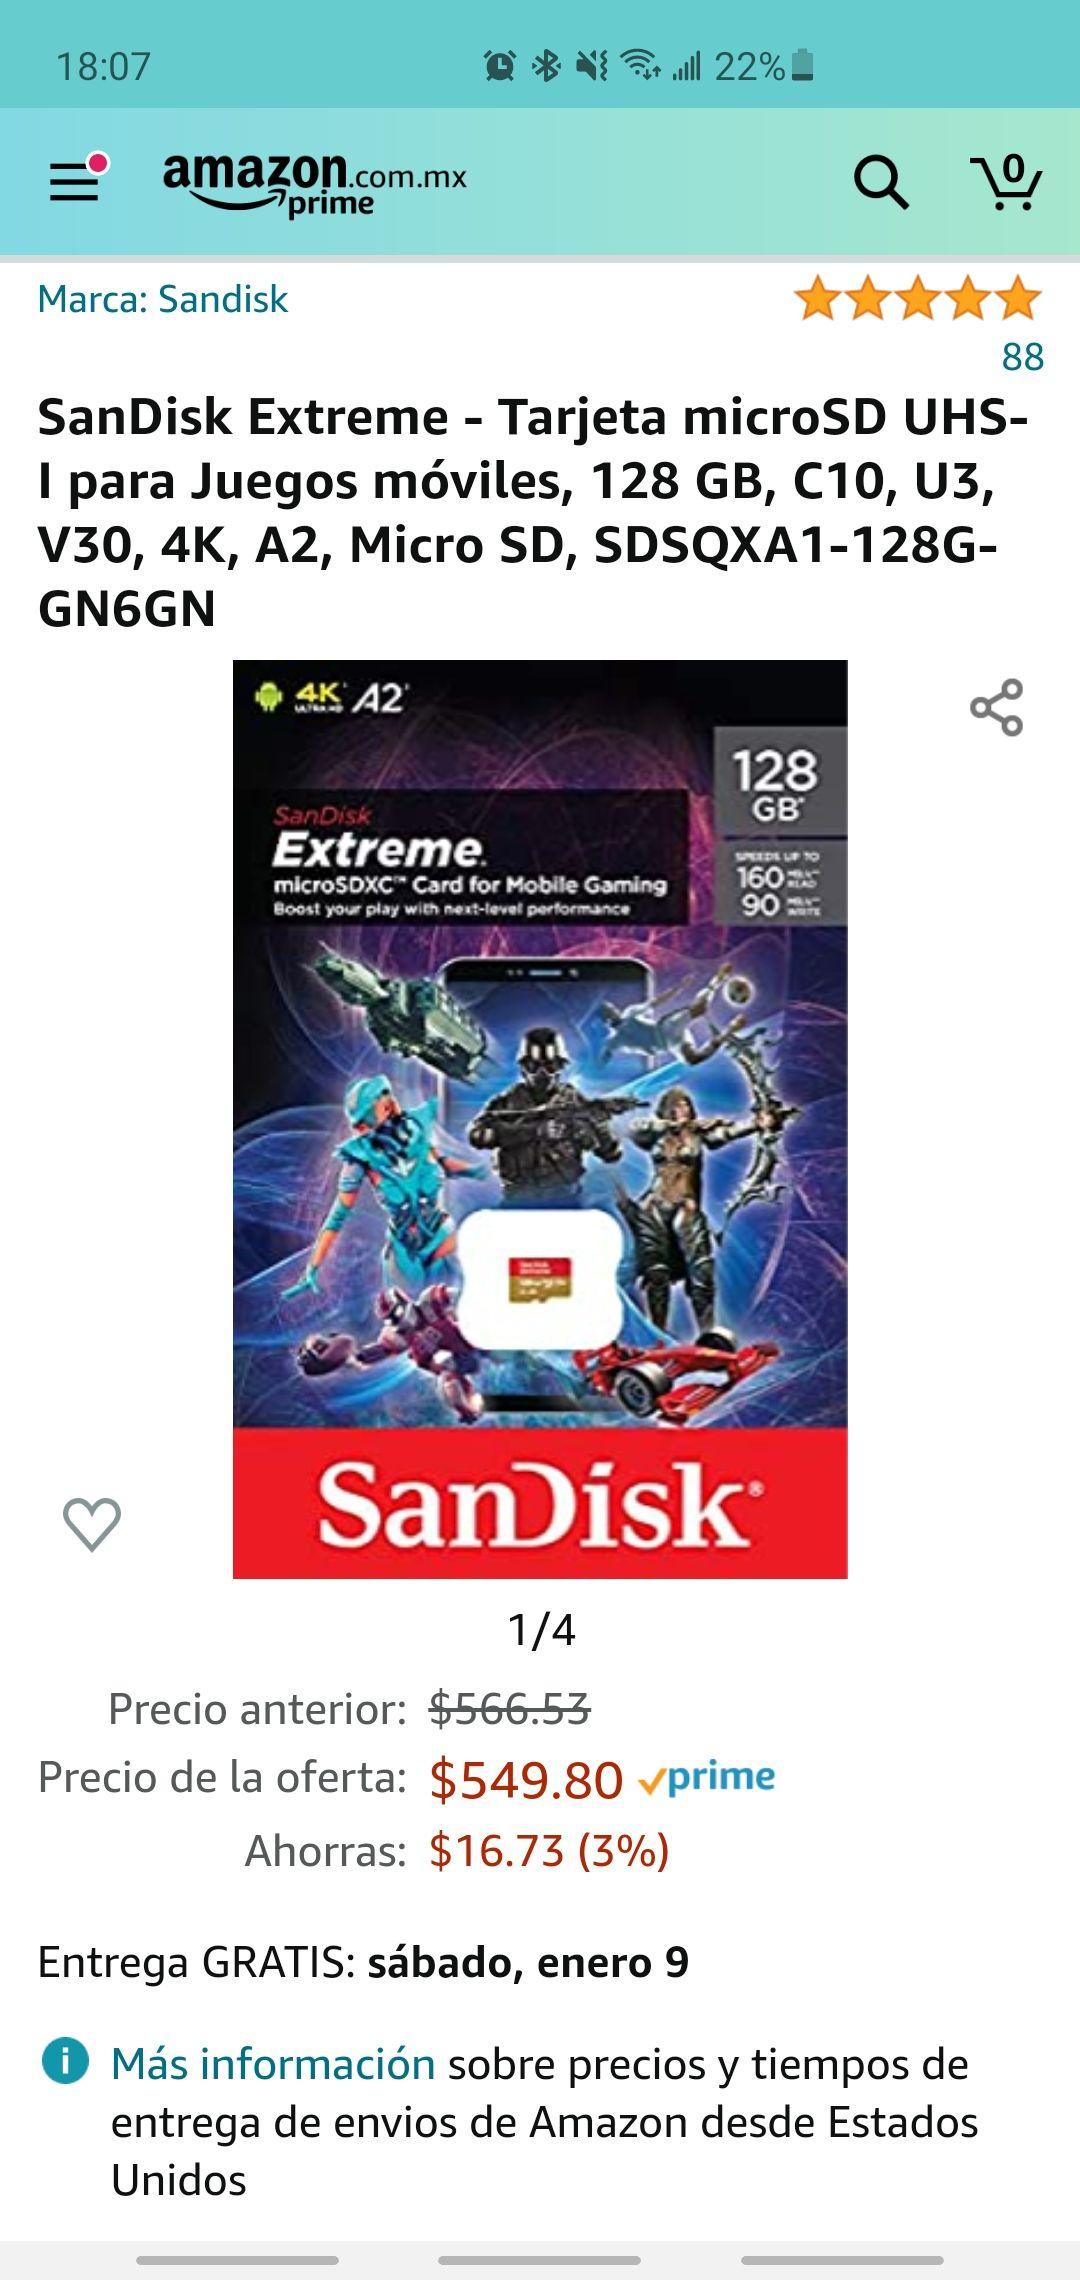 Amazon: Tarjeta microSD UHS-I para Juegos móviles, 128 GB, C10, U3, V30, 4K, A2, Micro SD, SDSQXA1-128G-GN6GN